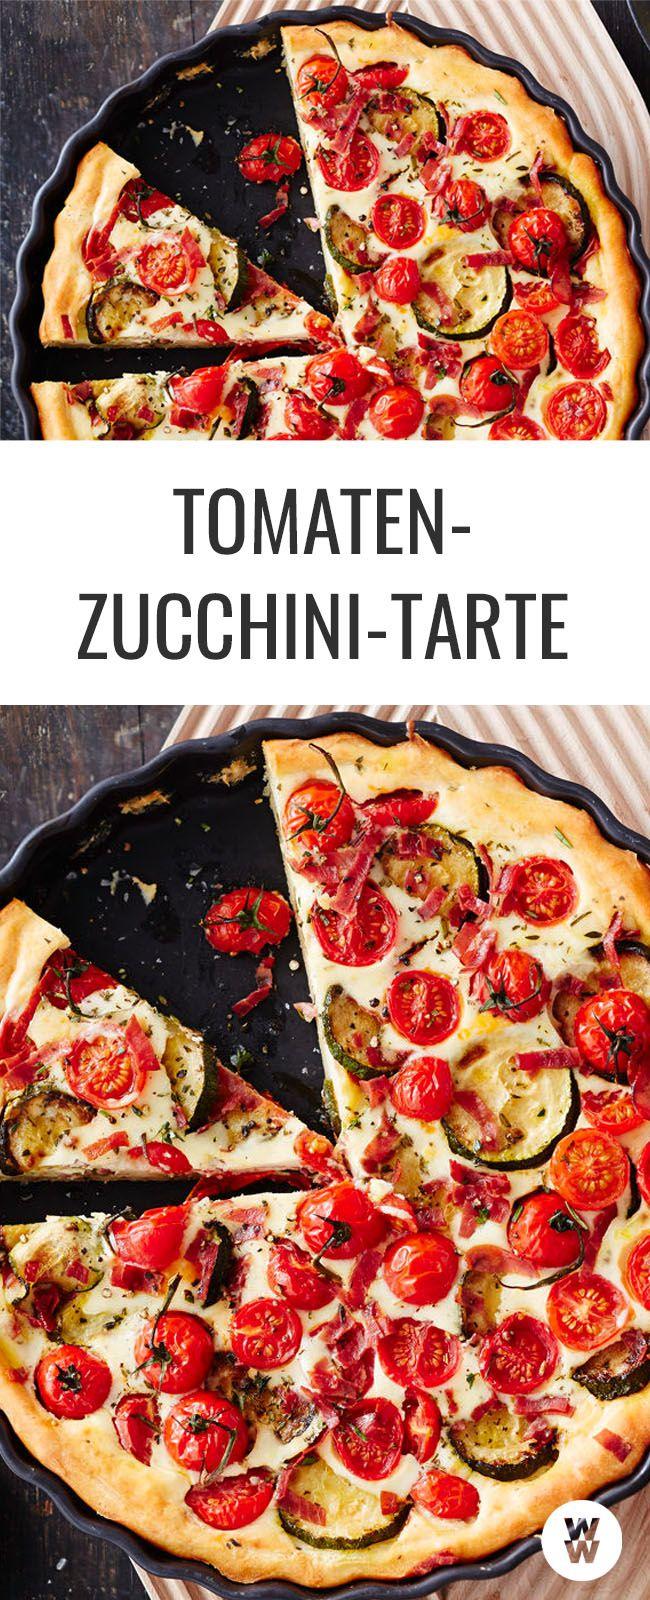 Photo of Tomato zucchini tart